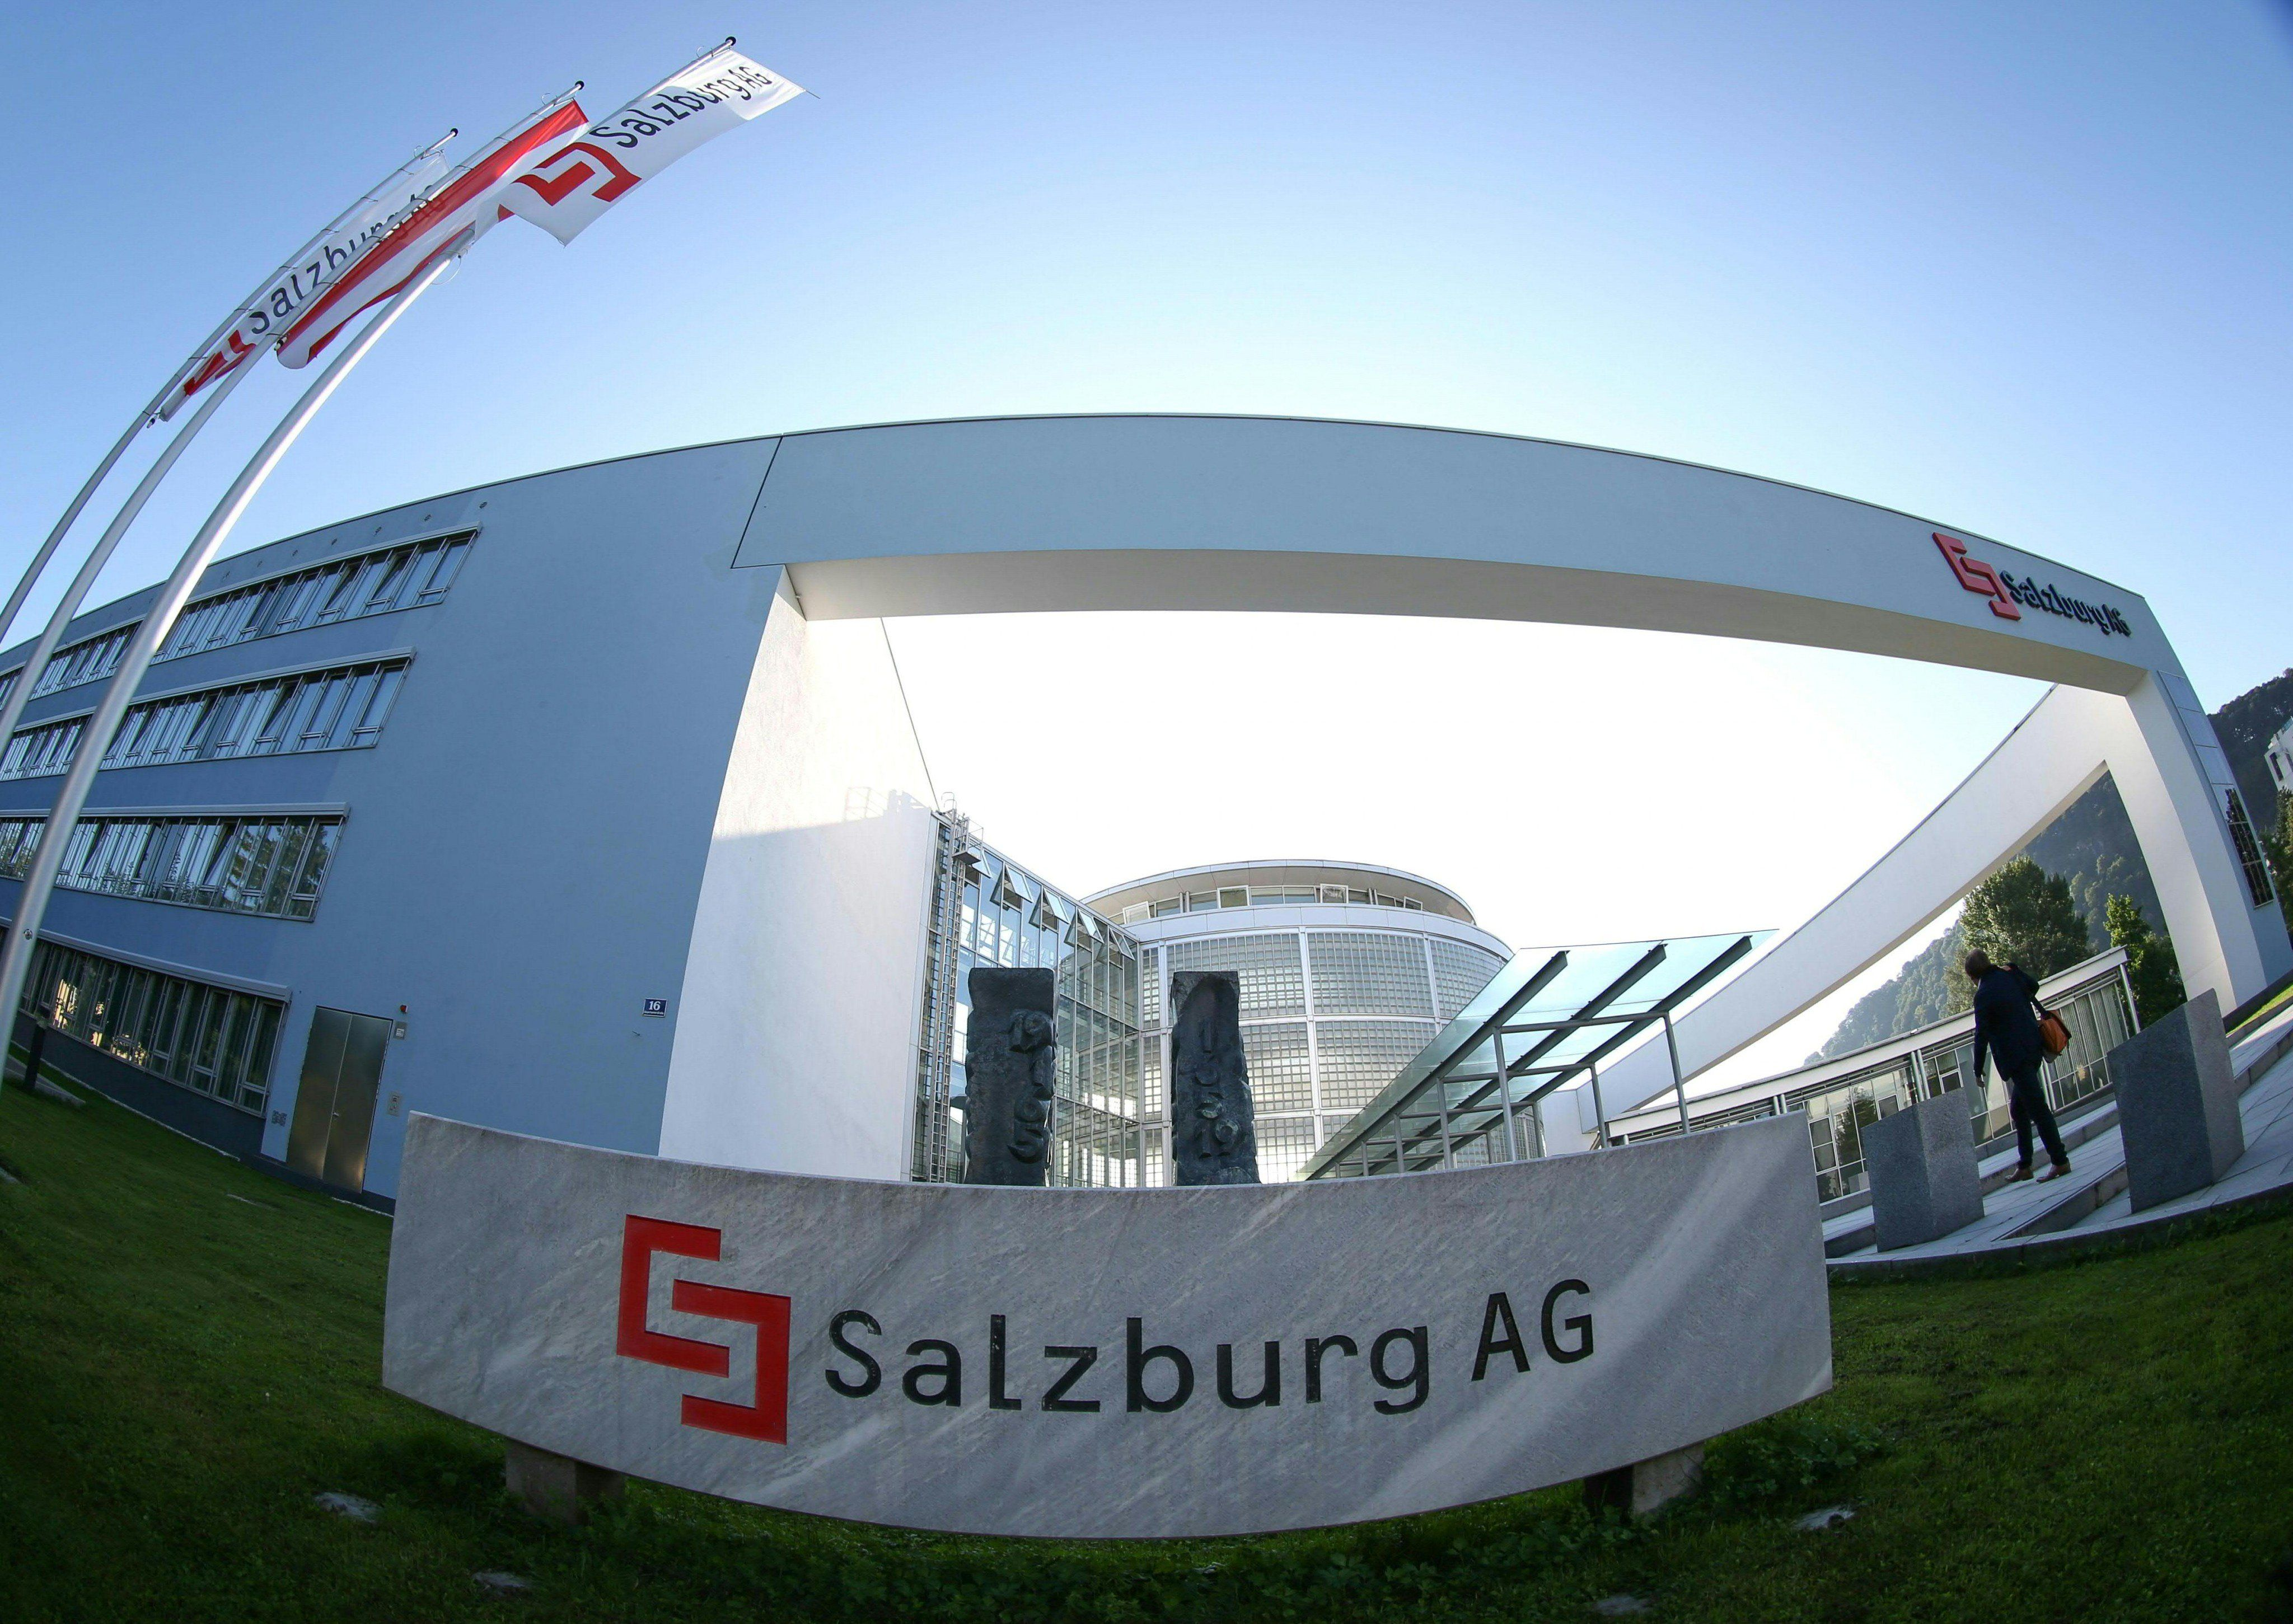 erotik salzburg ascort service